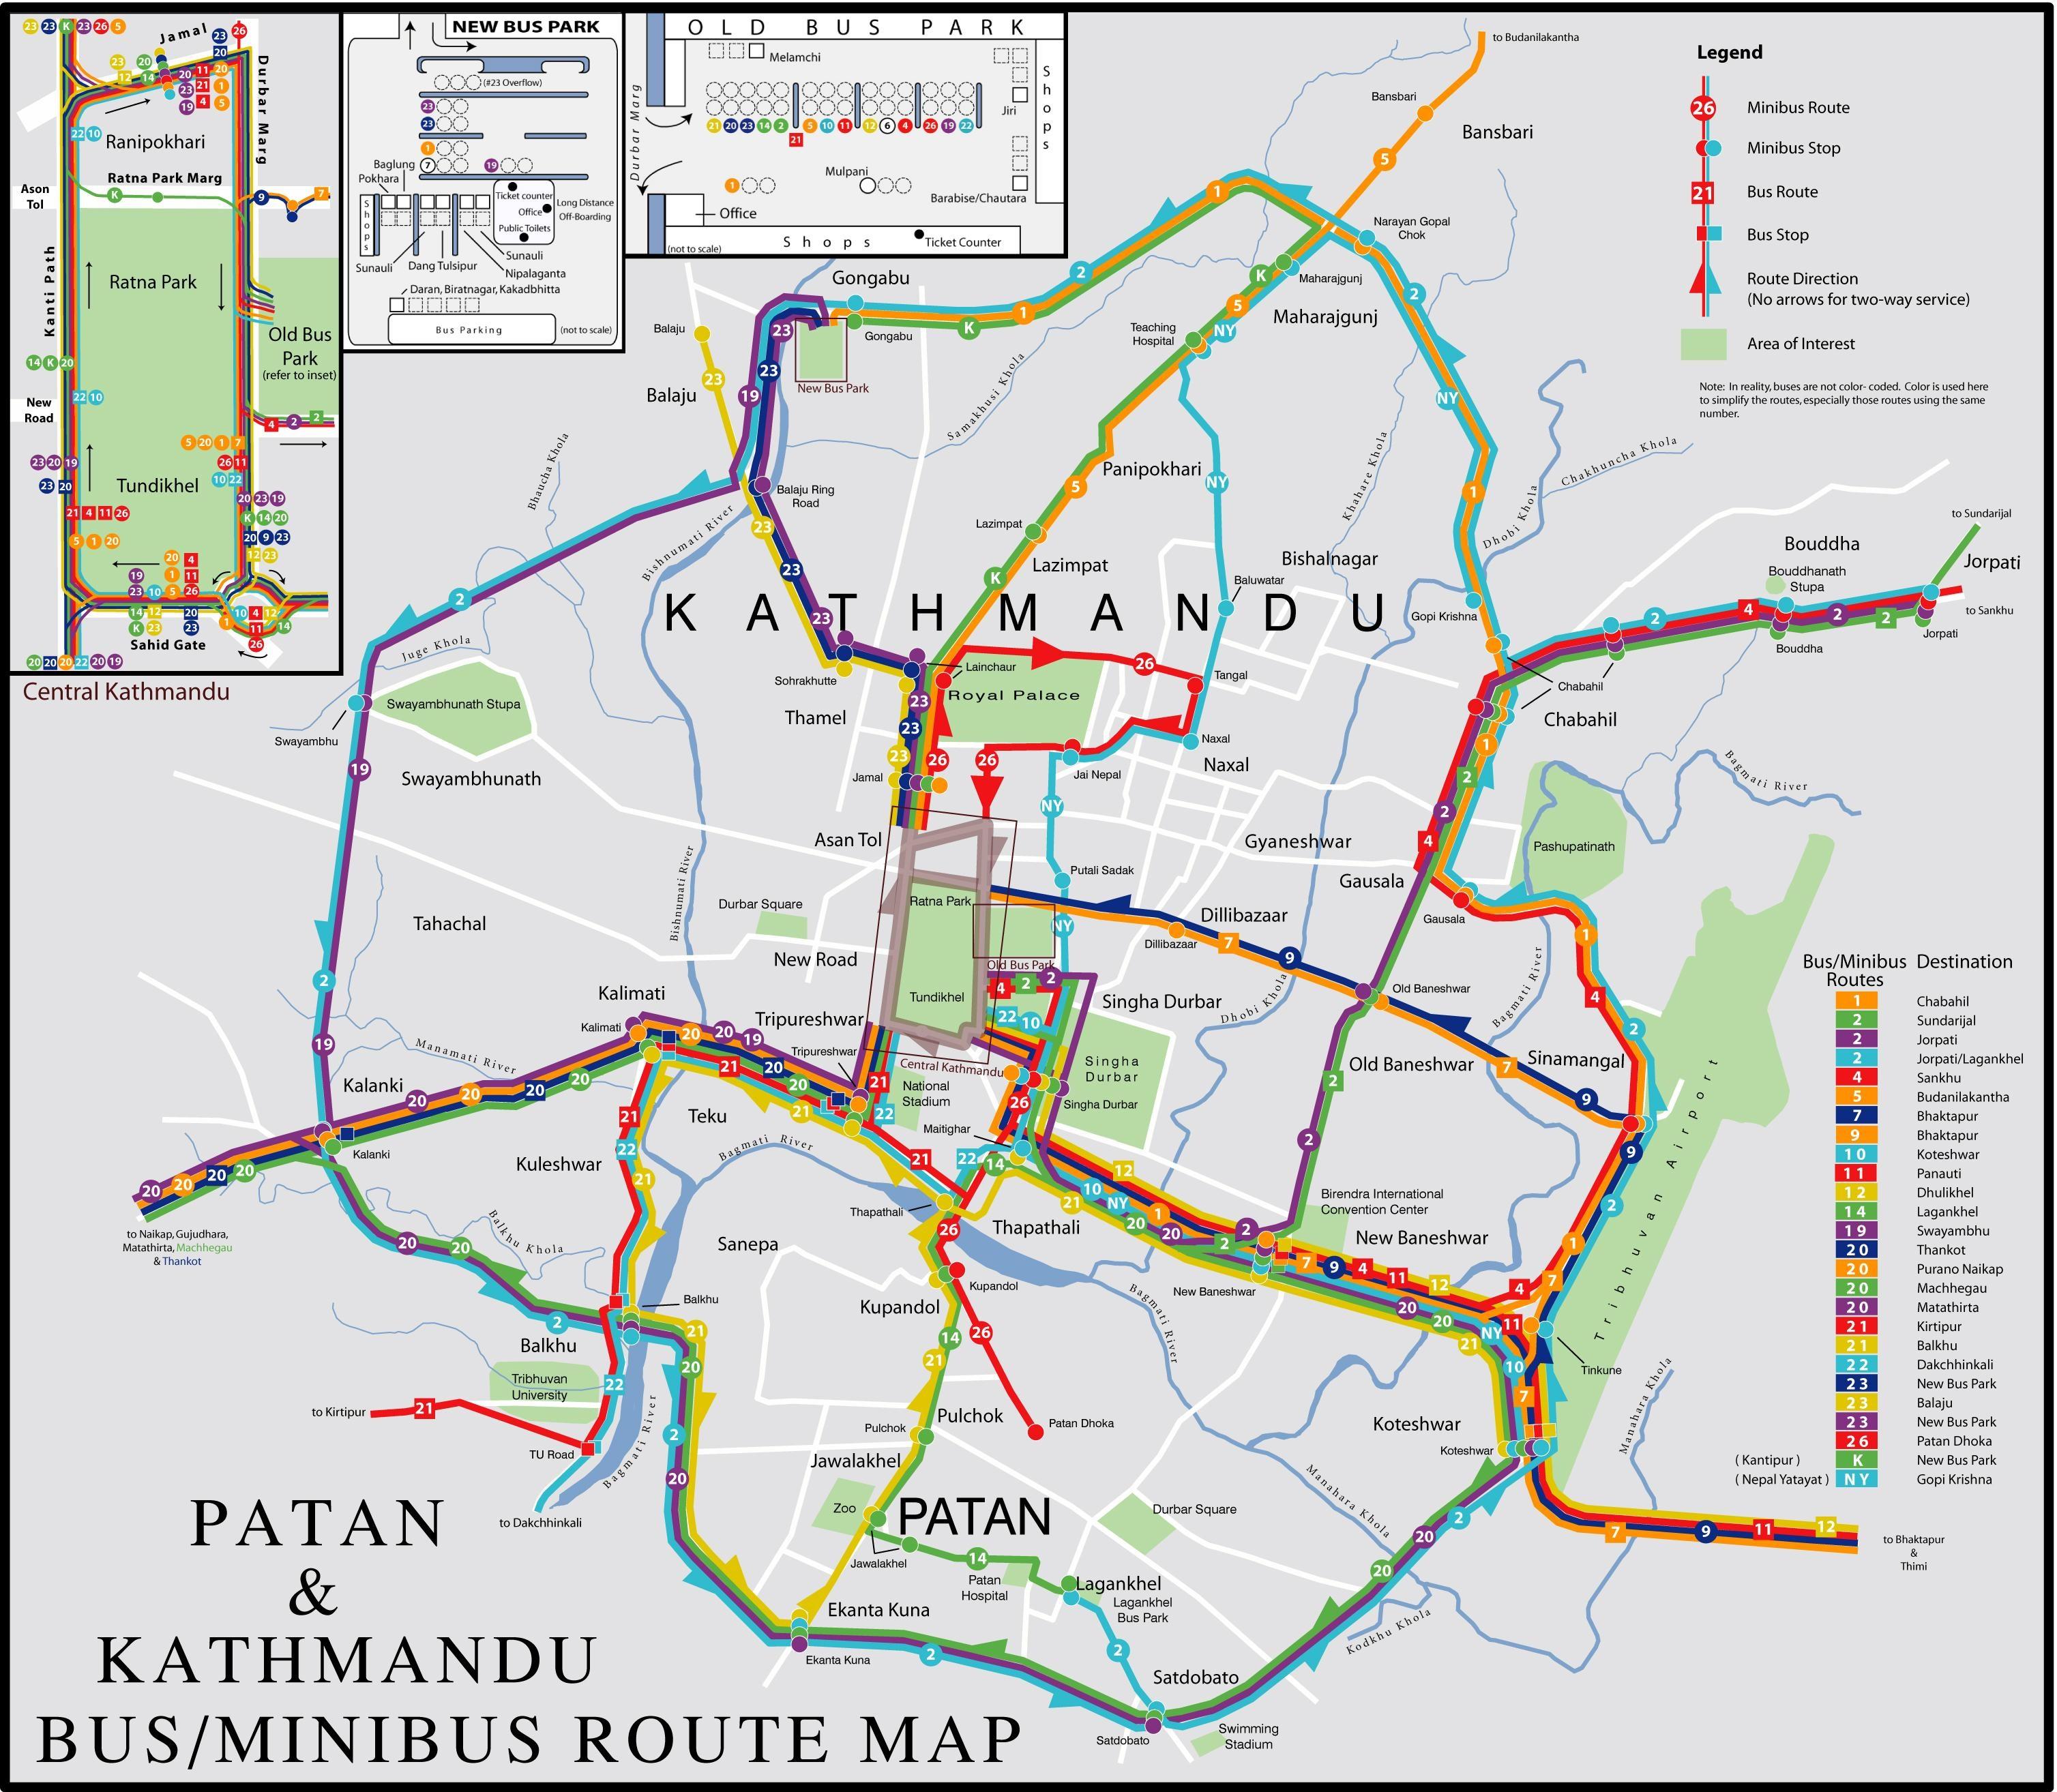 Kathmandu Travel Maps Tourist Map Guide in Kathmandu